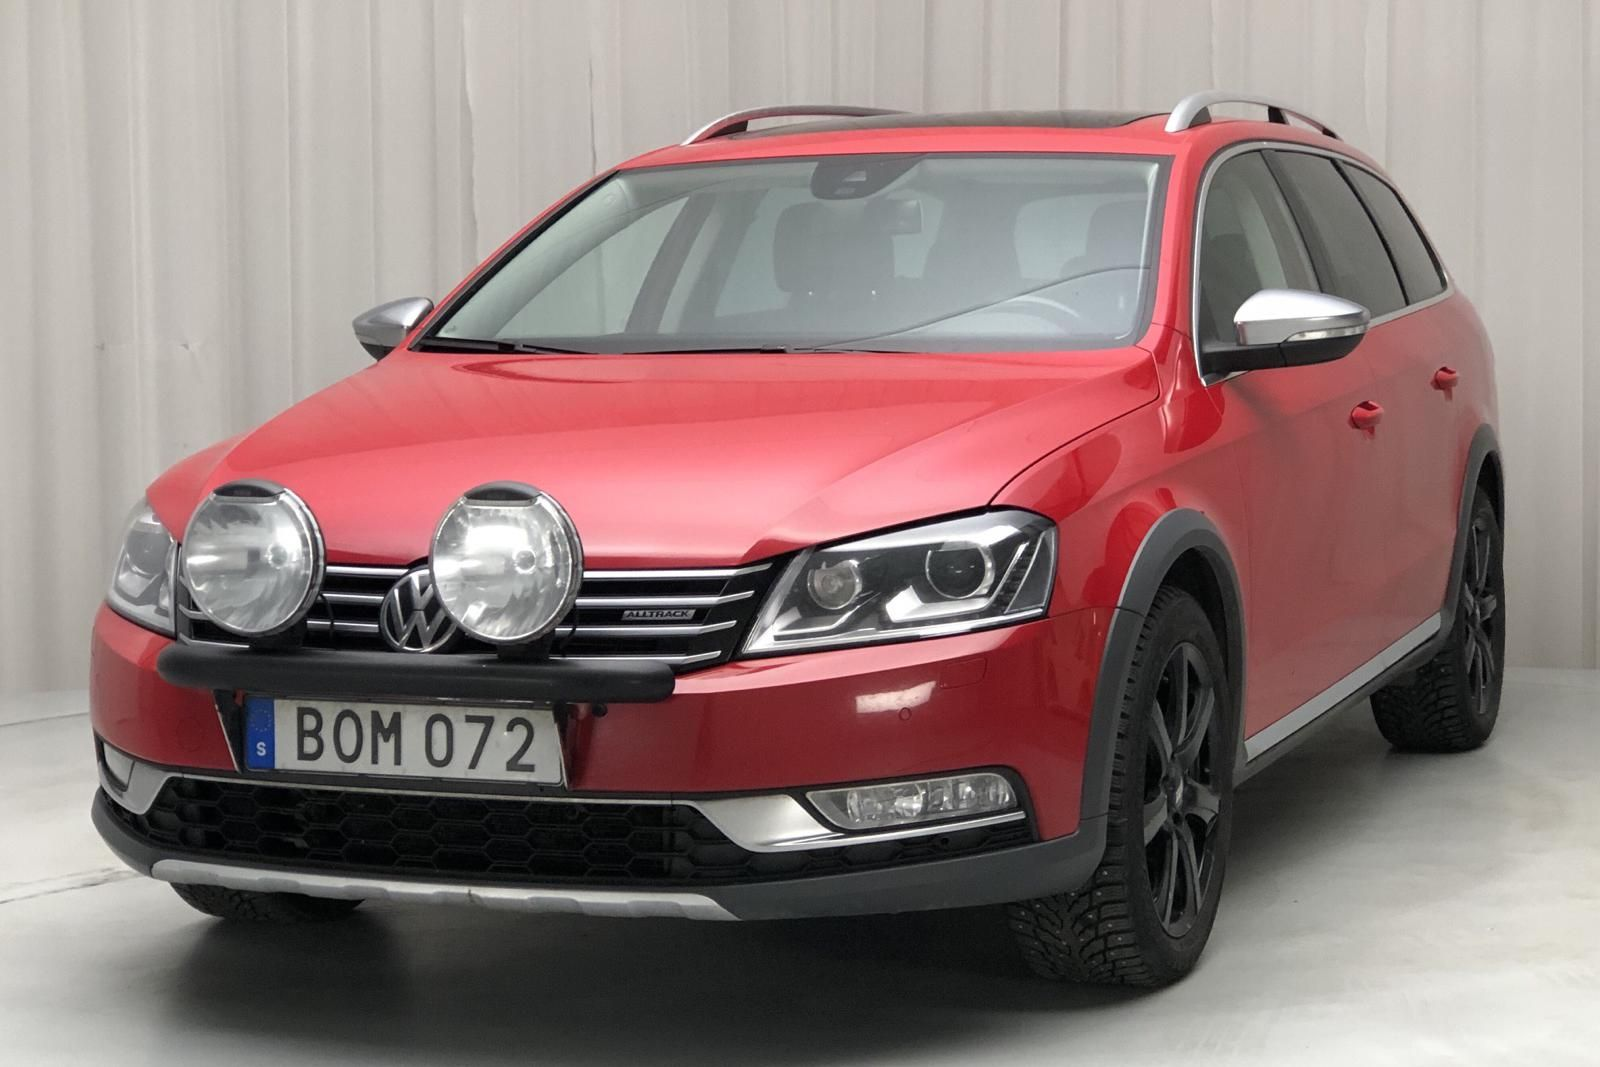 VW Passat Alltrack 2.0 TDI BlueMotion Technologie 4Motion (177Hk)